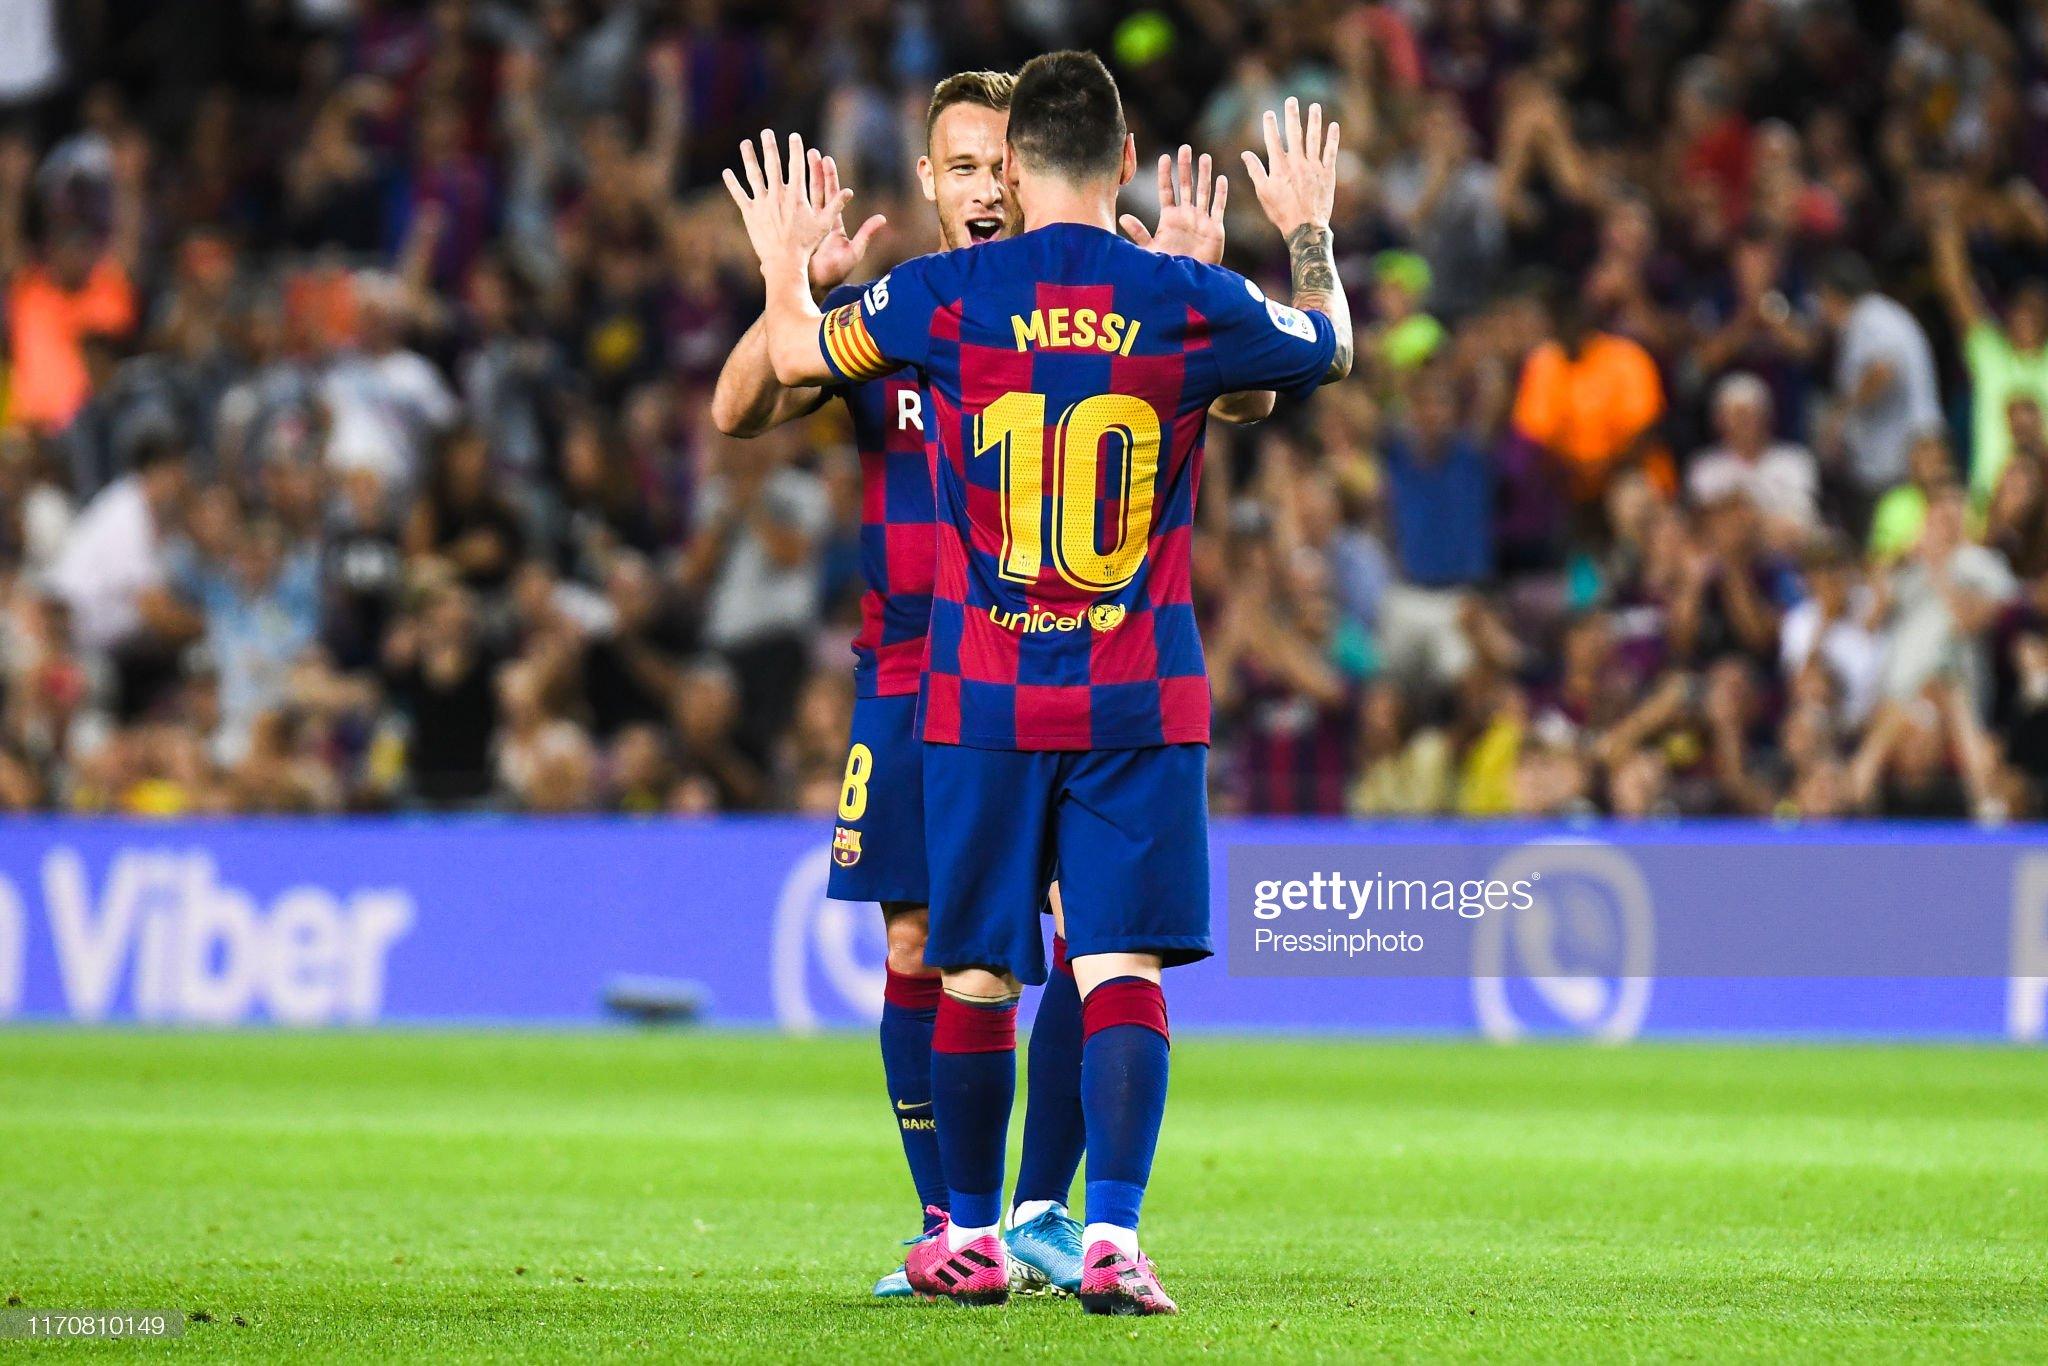 صور مباراة : برشلونة - فياريال 2-1 ( 24-09-2019 )  Arthur-melo-of-fc-barcelona-celebrates-his-goal-with-his-teammates-picture-id1170810149?s=2048x2048